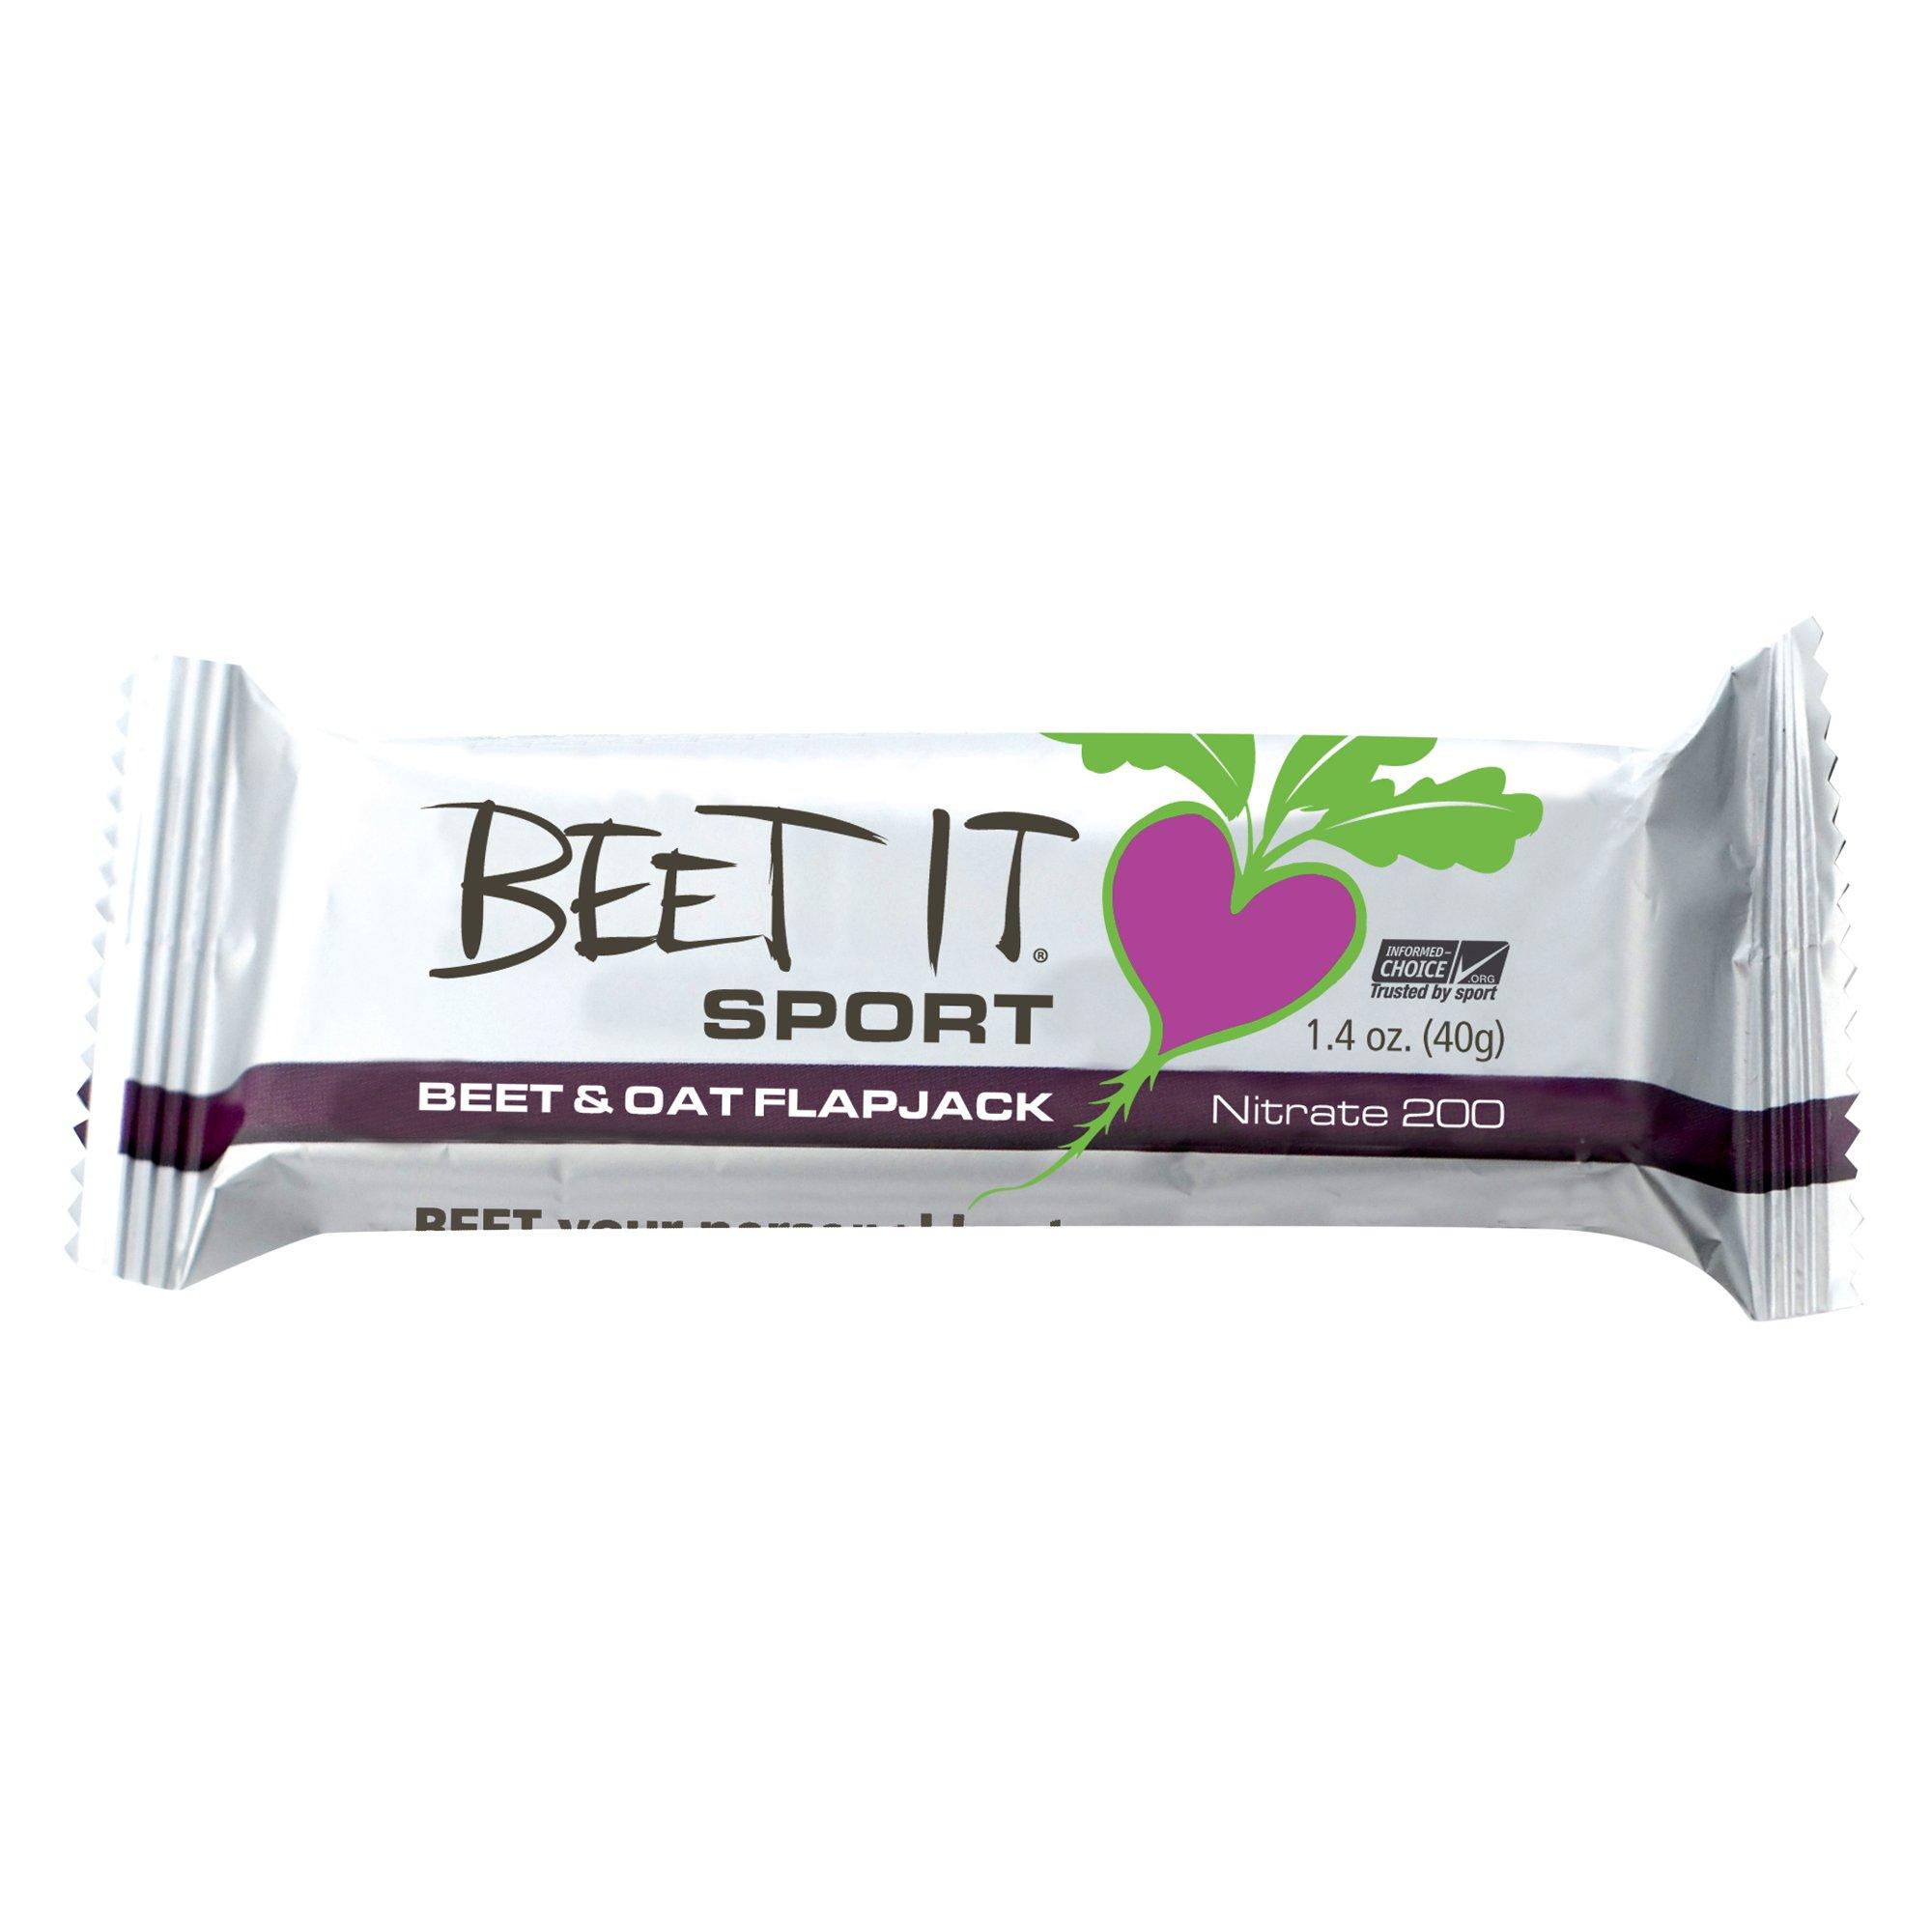 Nitrate 200 - Beet IT Sport Beet & Oat Flapjack 1.4oz (25 counts)